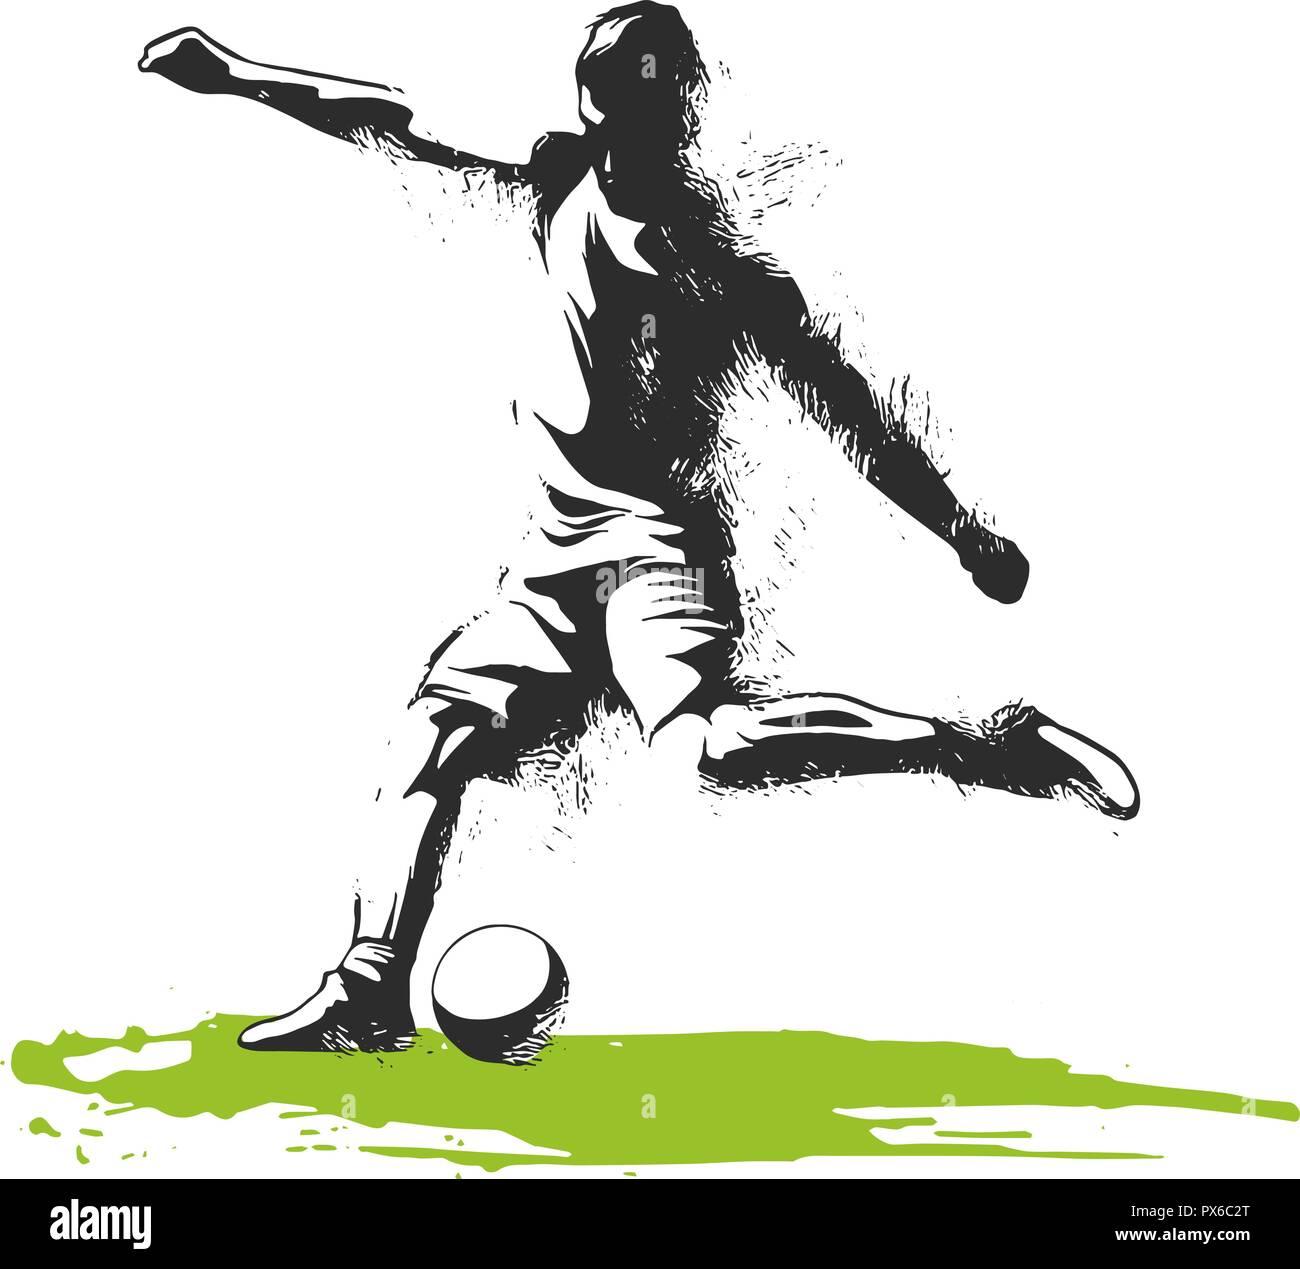 Soccer player kicking ball. illustration of sport - Stock Image